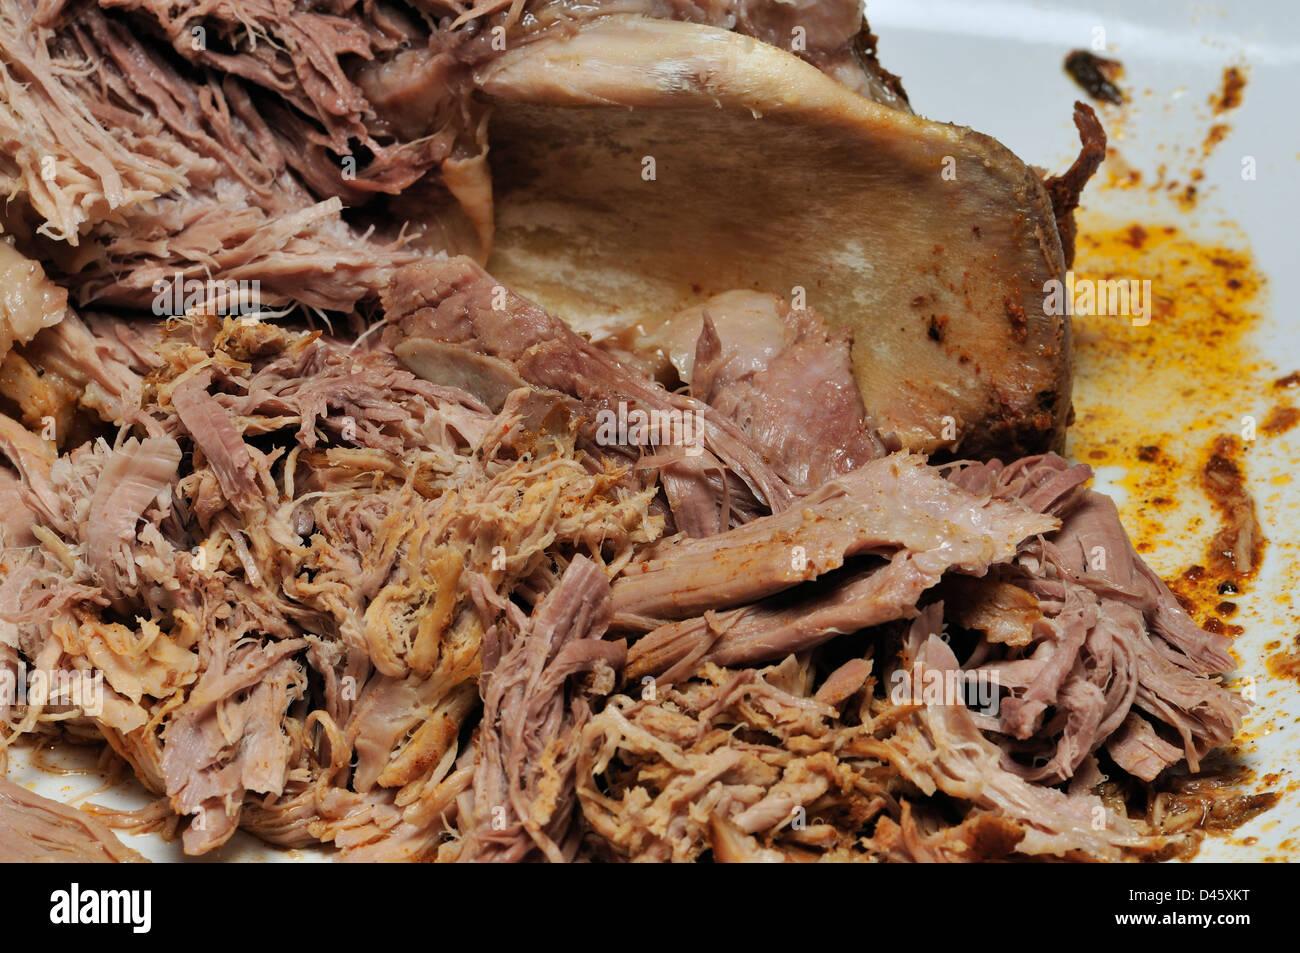 Carne de cerdo - cerdo cocinado lentamente sacó aparte Imagen De Stock